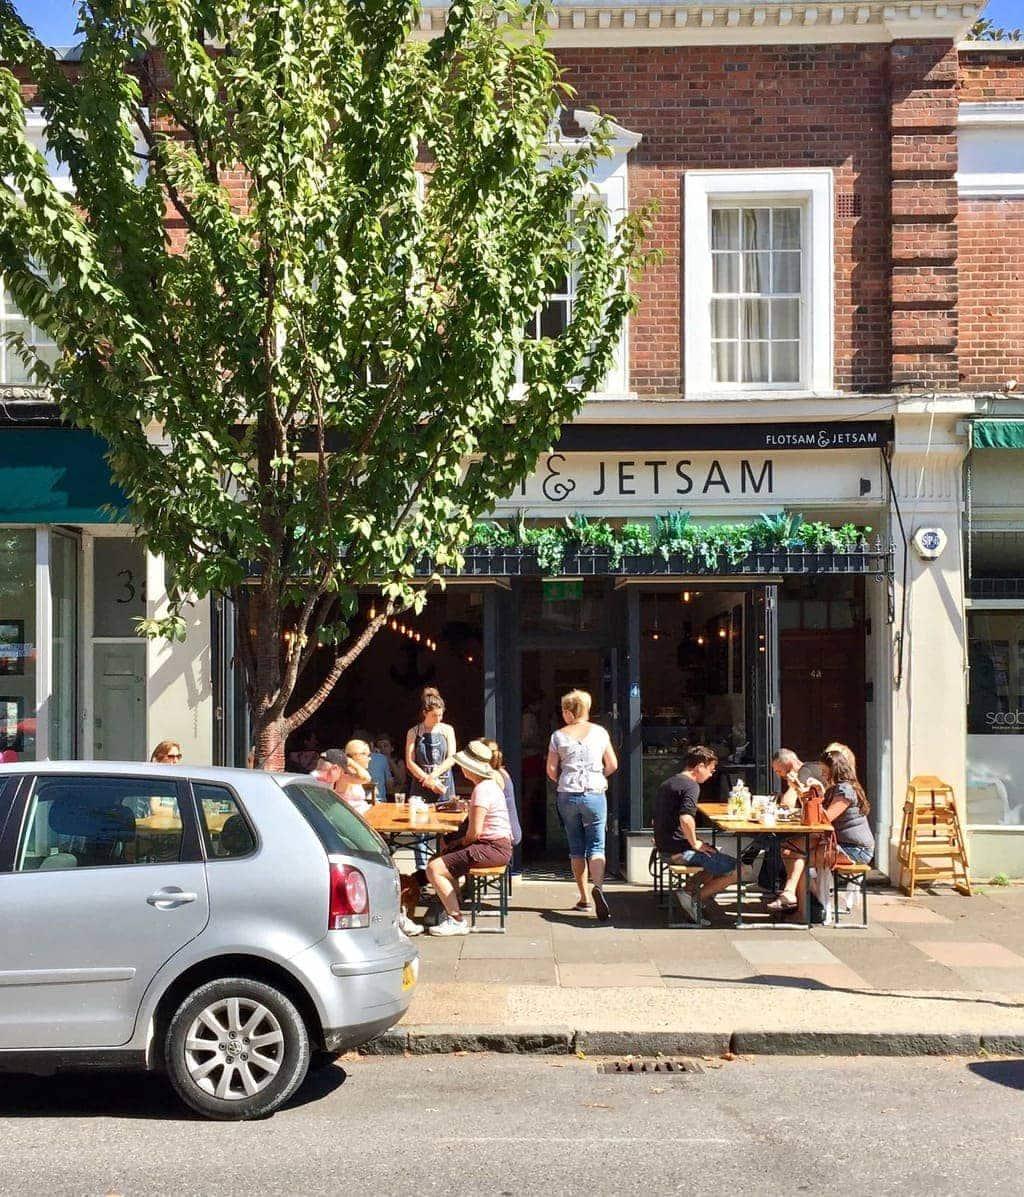 Flotsam & Jetsem - #365LDNCafes - 365 London Cafes in 365 Days By Alexandra Kalinowski